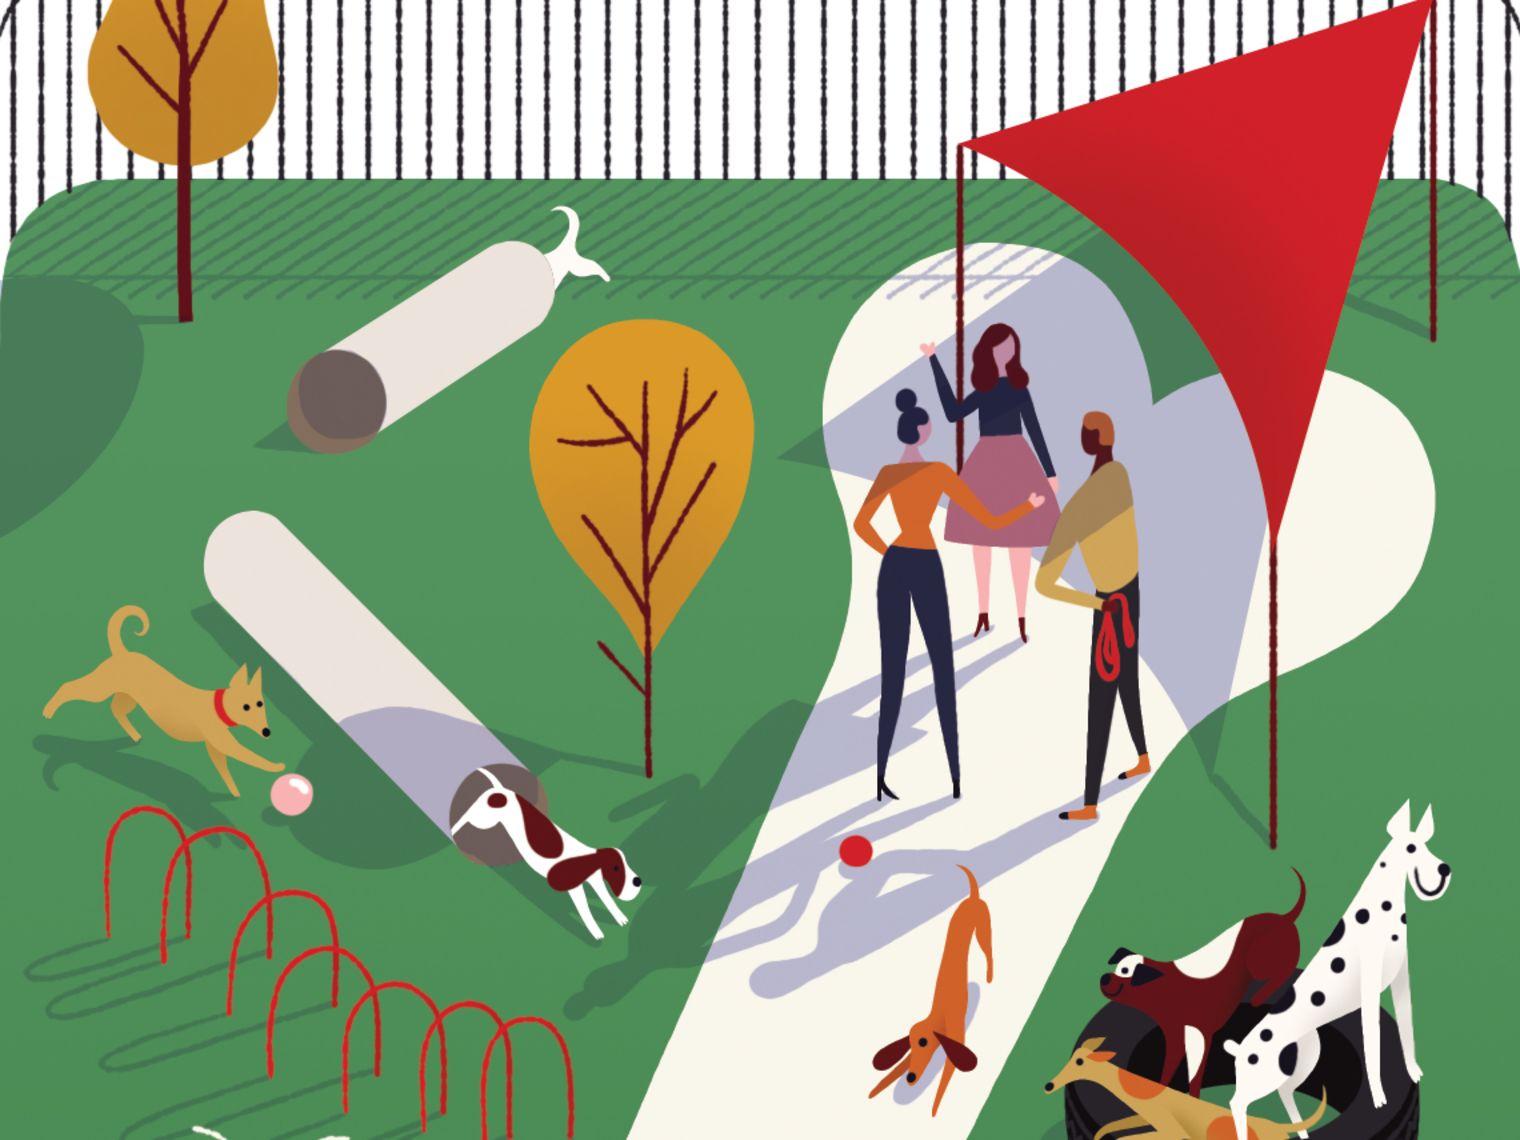 Pomo 0217 pets dog park illustration ie4k9z